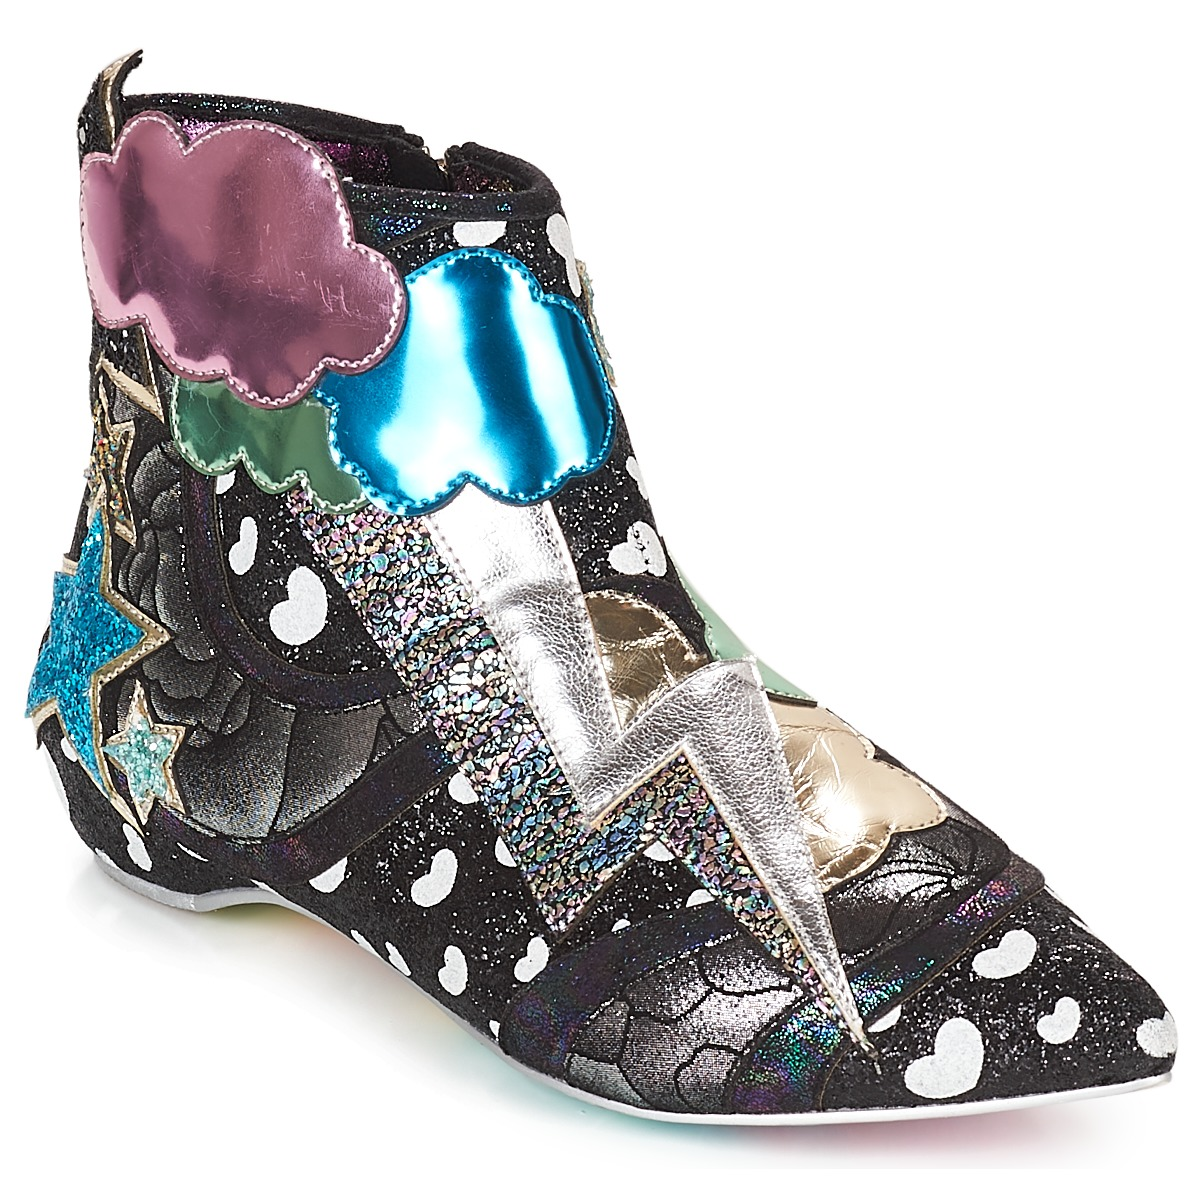 Støvler Irregular Choice  Electric boots